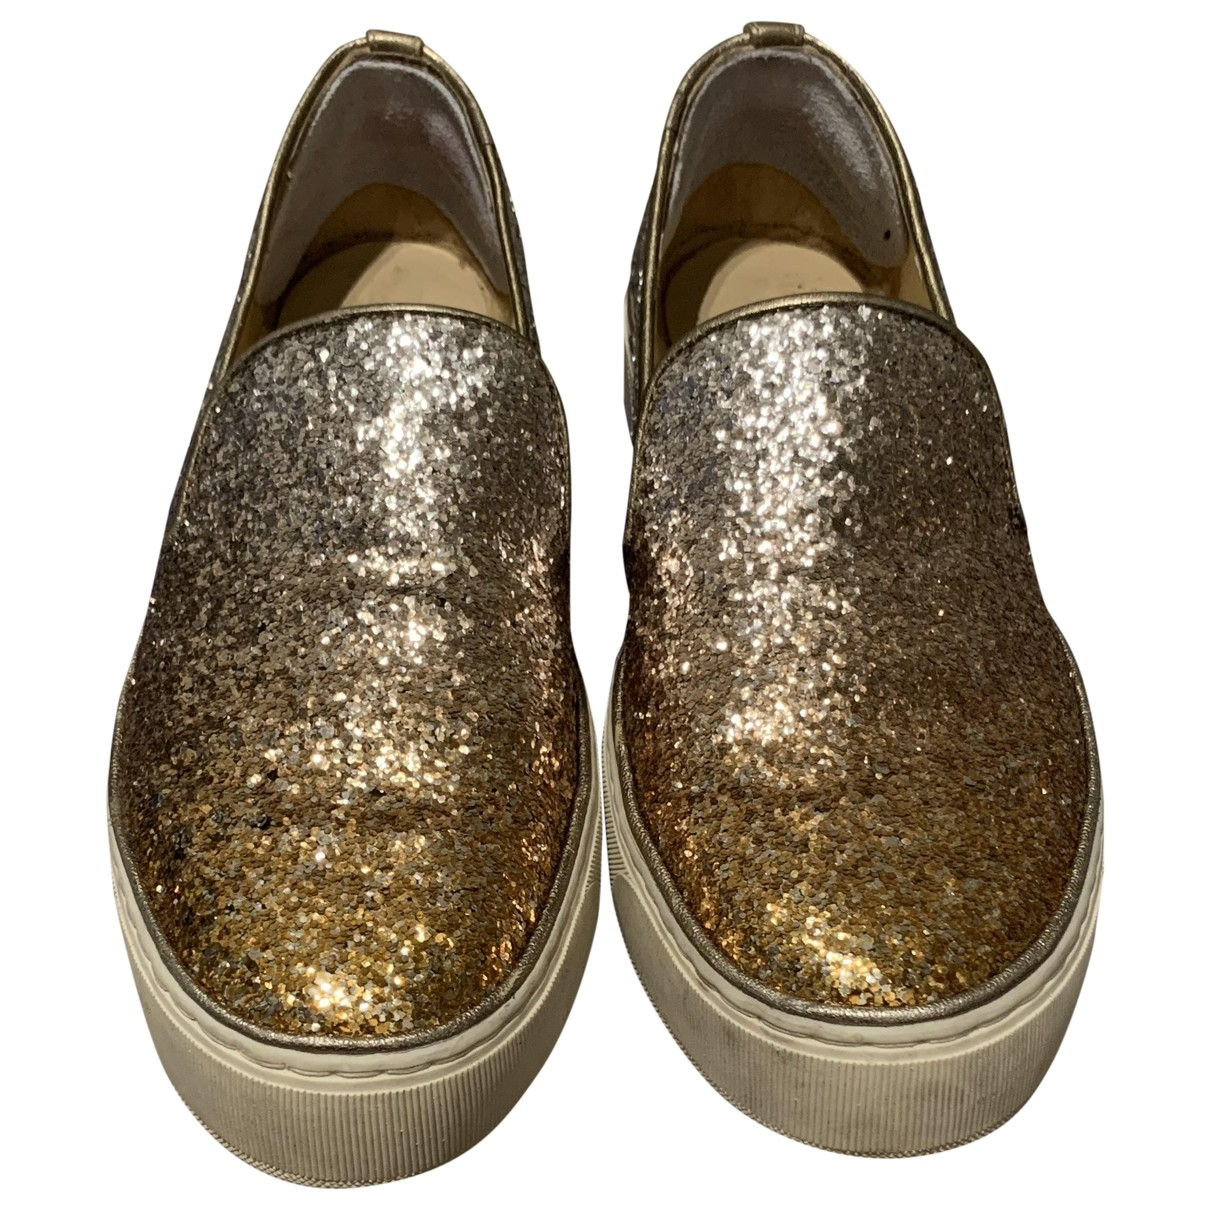 Stuart Weitzman \N Sneakers in  Gold Mit Pailletten